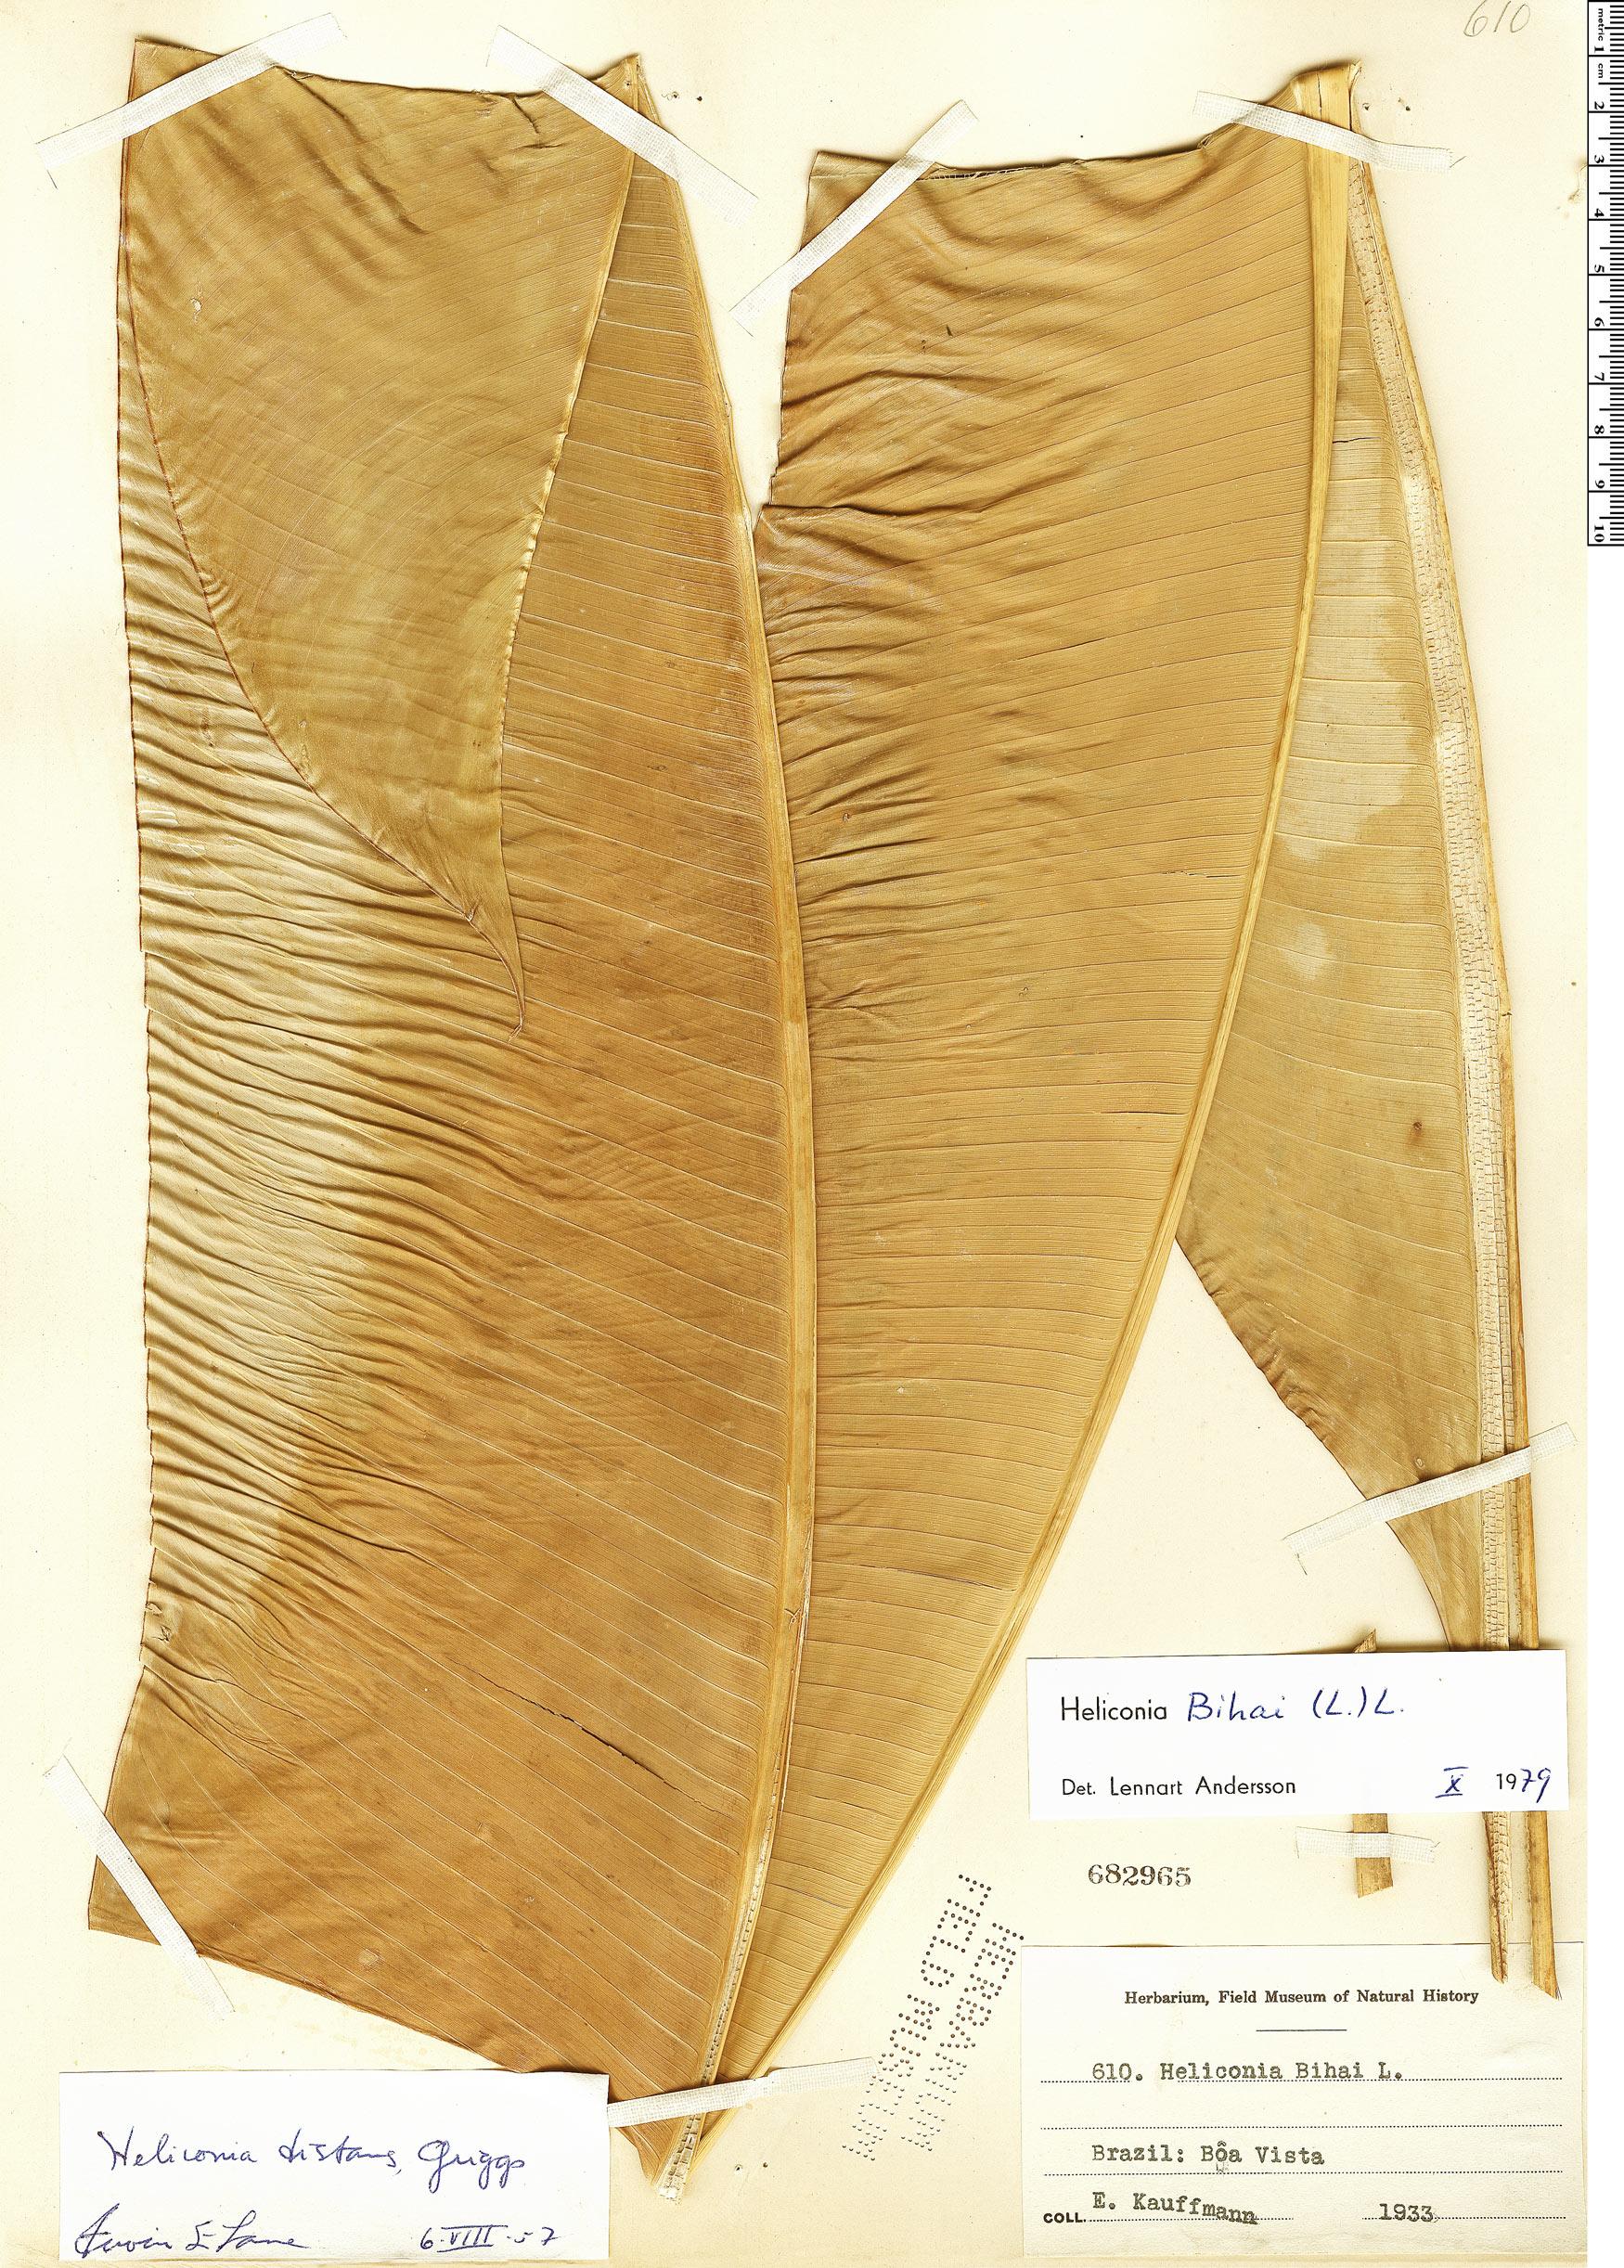 Specimen: Heliconia bihai